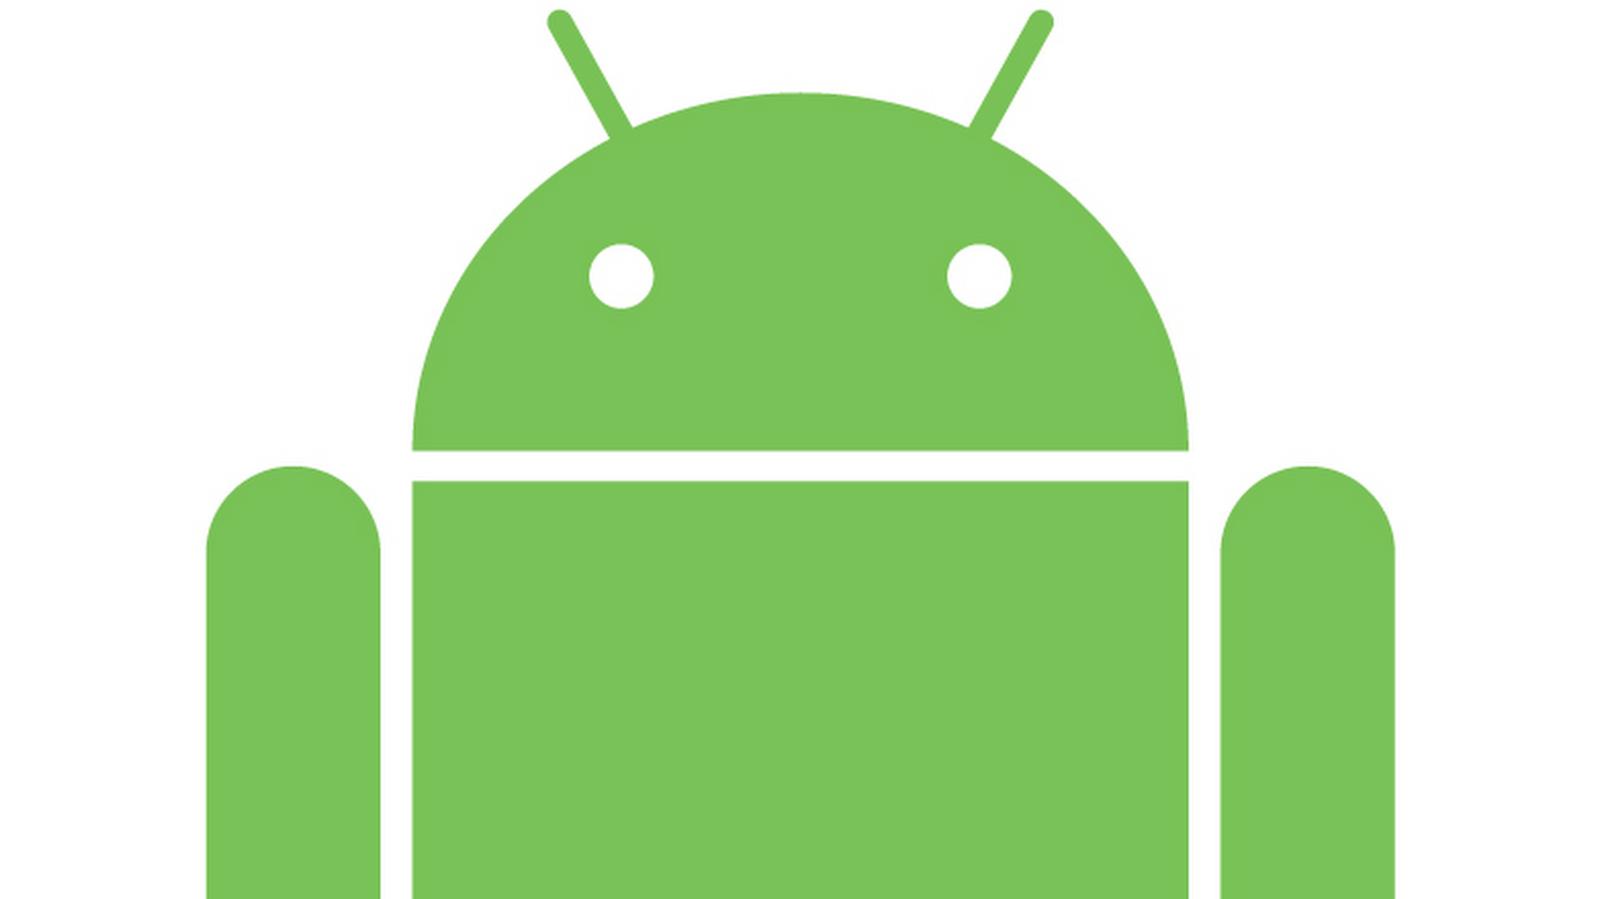 Android 10: Standort beschränken